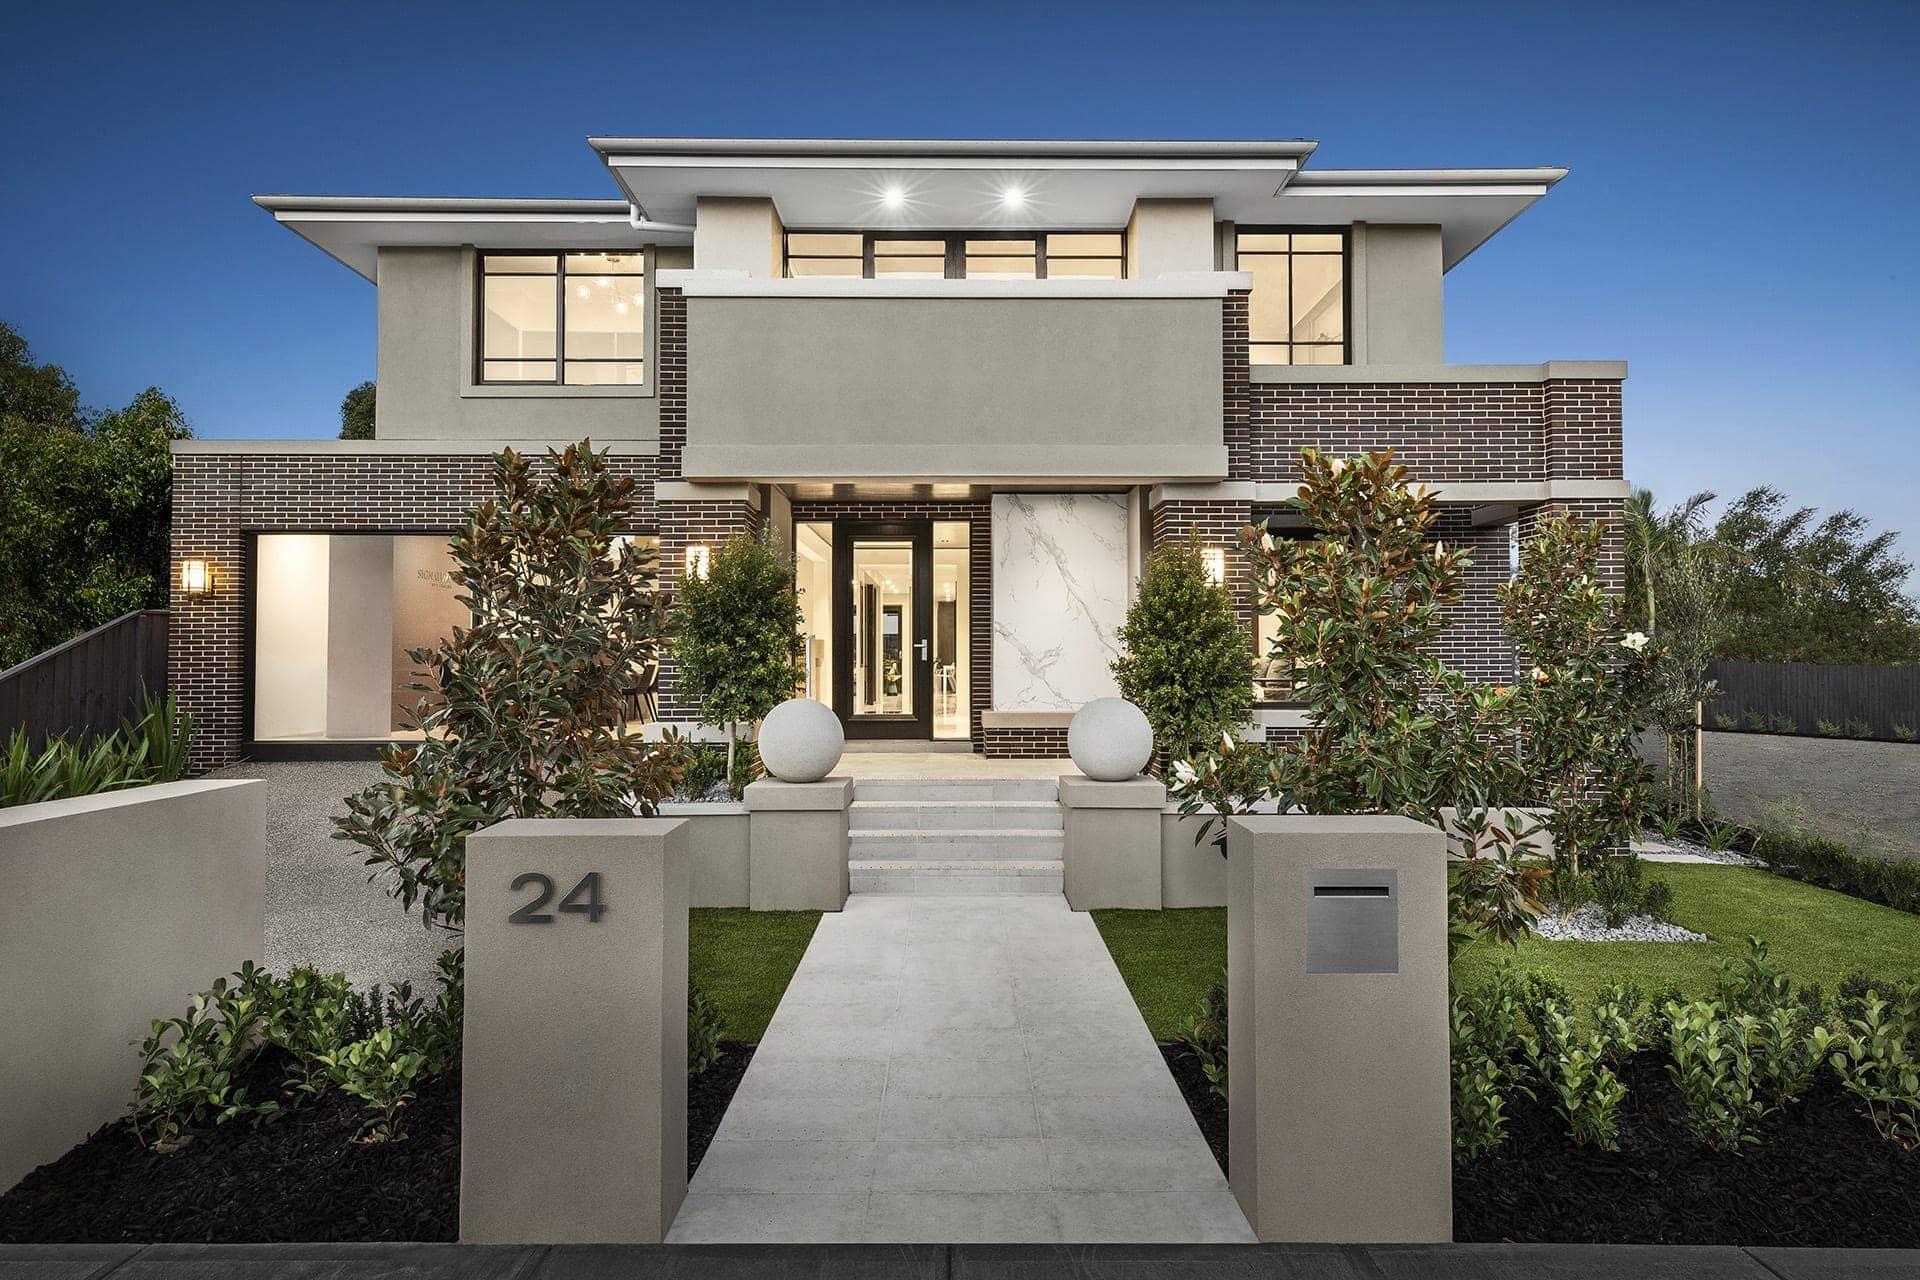 metricon hampshire display home with empire facade